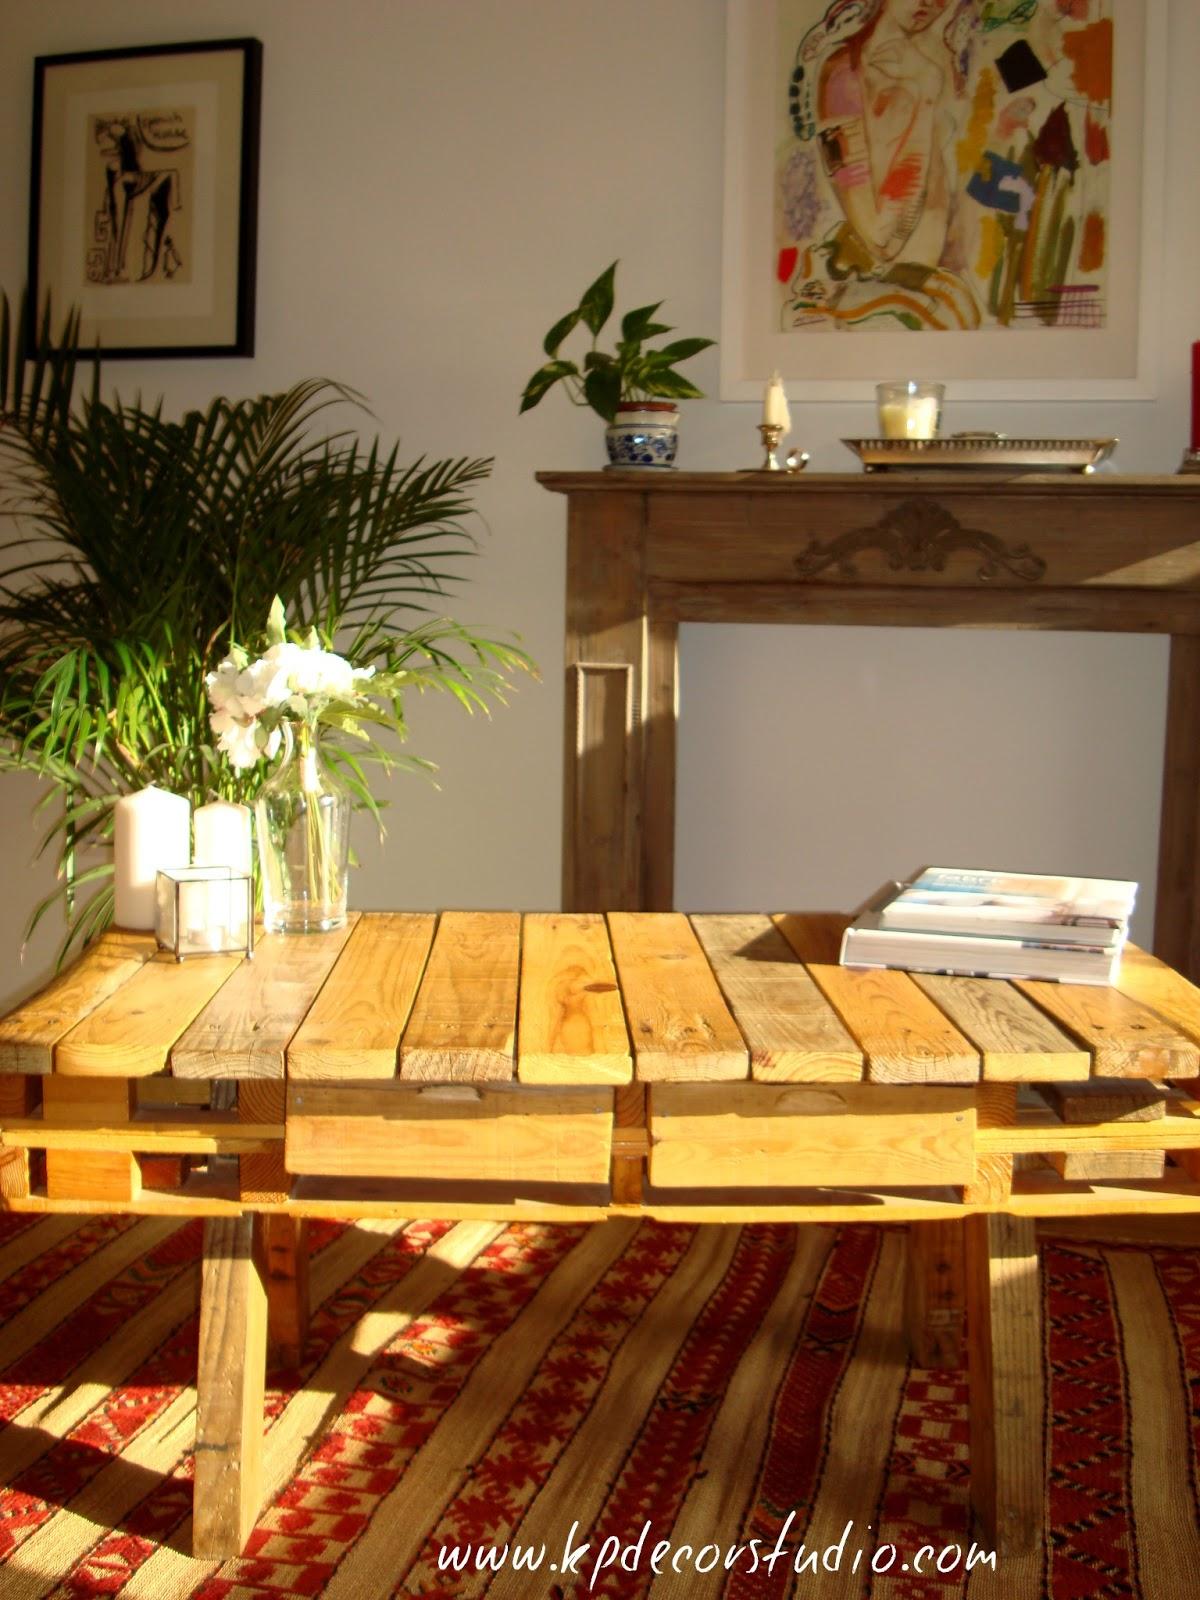 Kp Tienda Vintage Online Mesas De Palet Pallet Tables